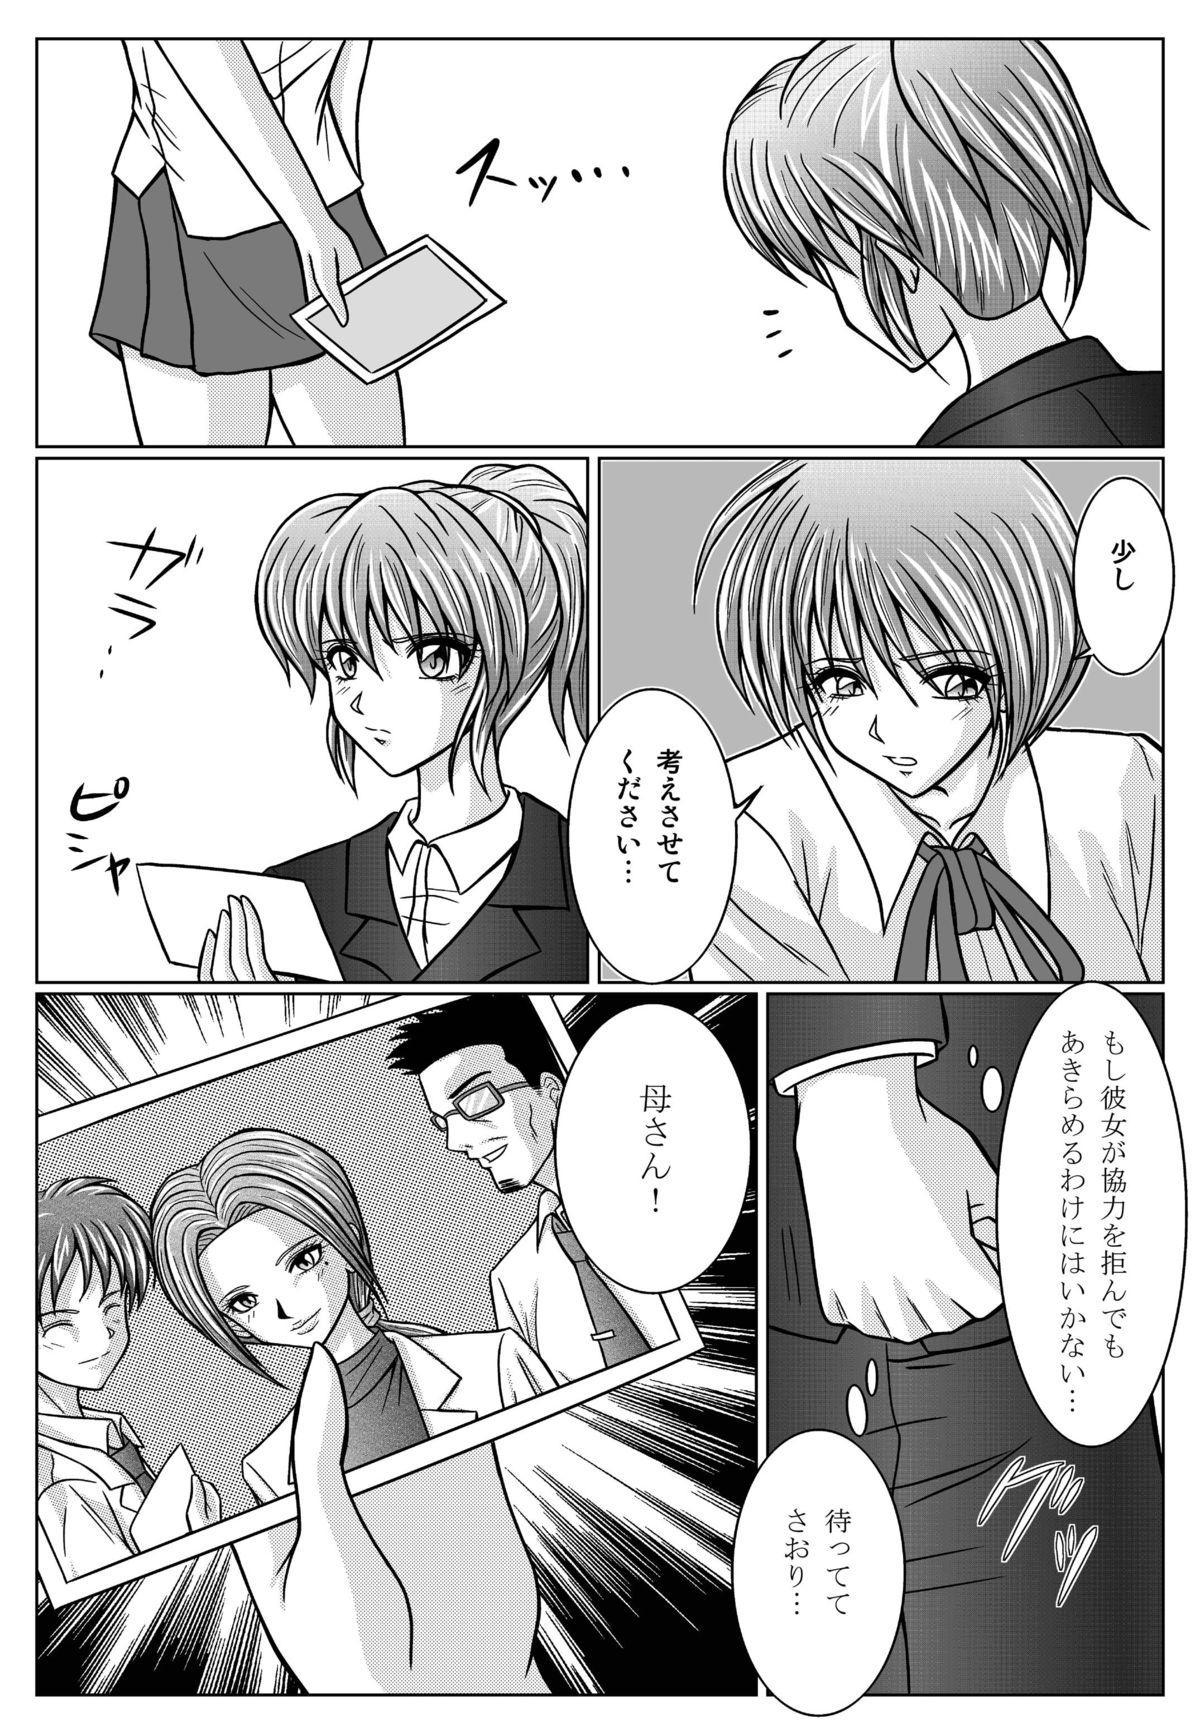 [Macxe's (monmon)] Tokubousentai Dinaranger ~Heroine Kairaku Sennou Keikaku~ Vol.01/02/03 (Renkaban) [Digital] 82